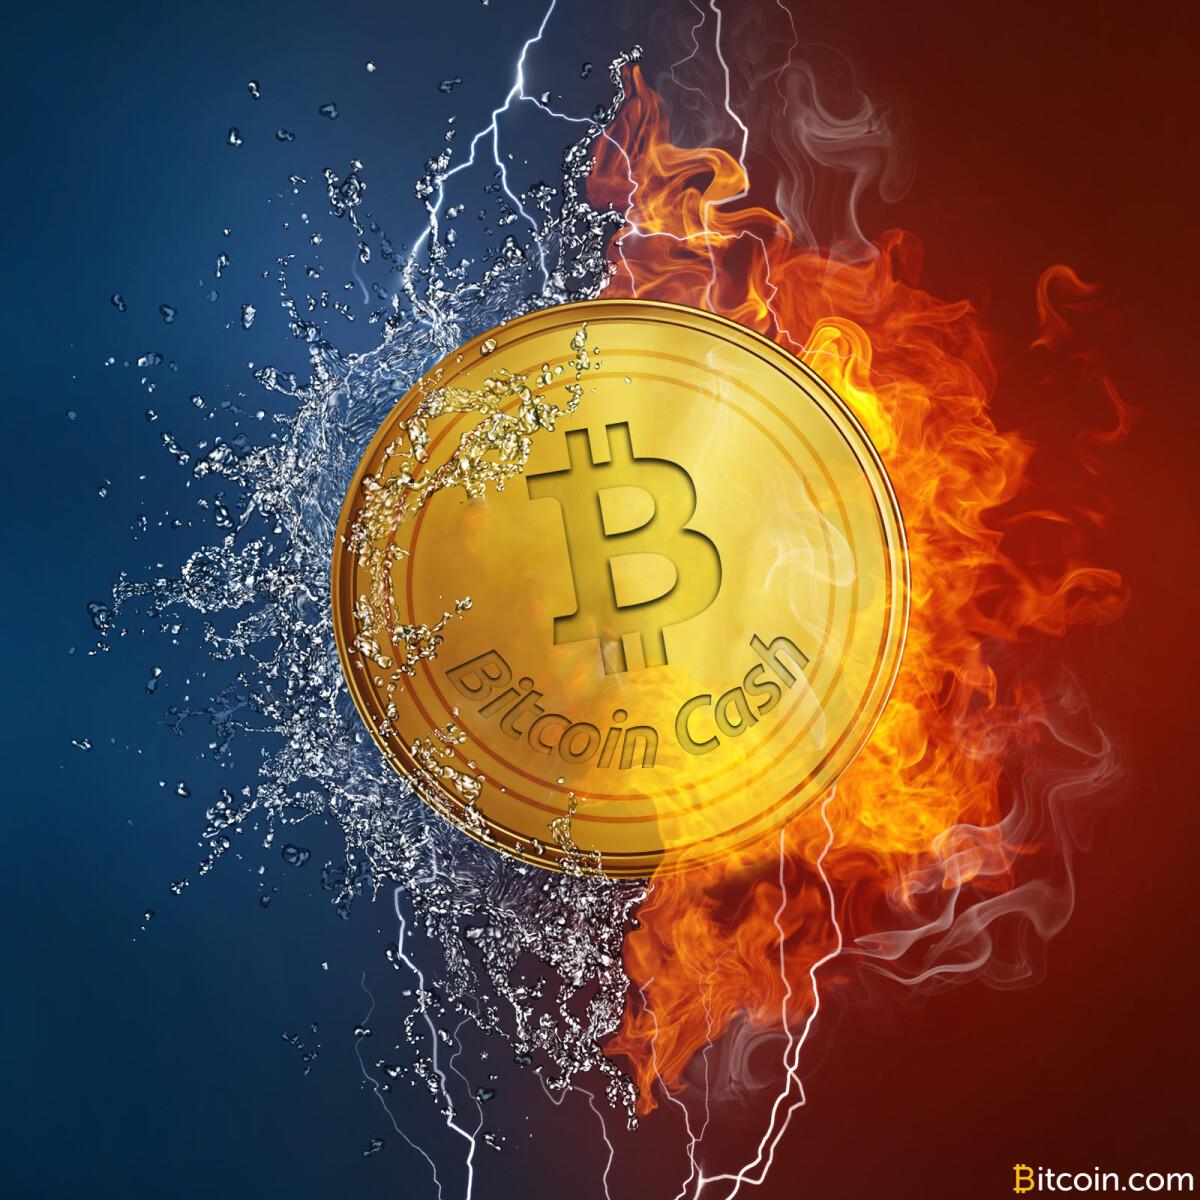 Photo credit: news.bitcoin.com